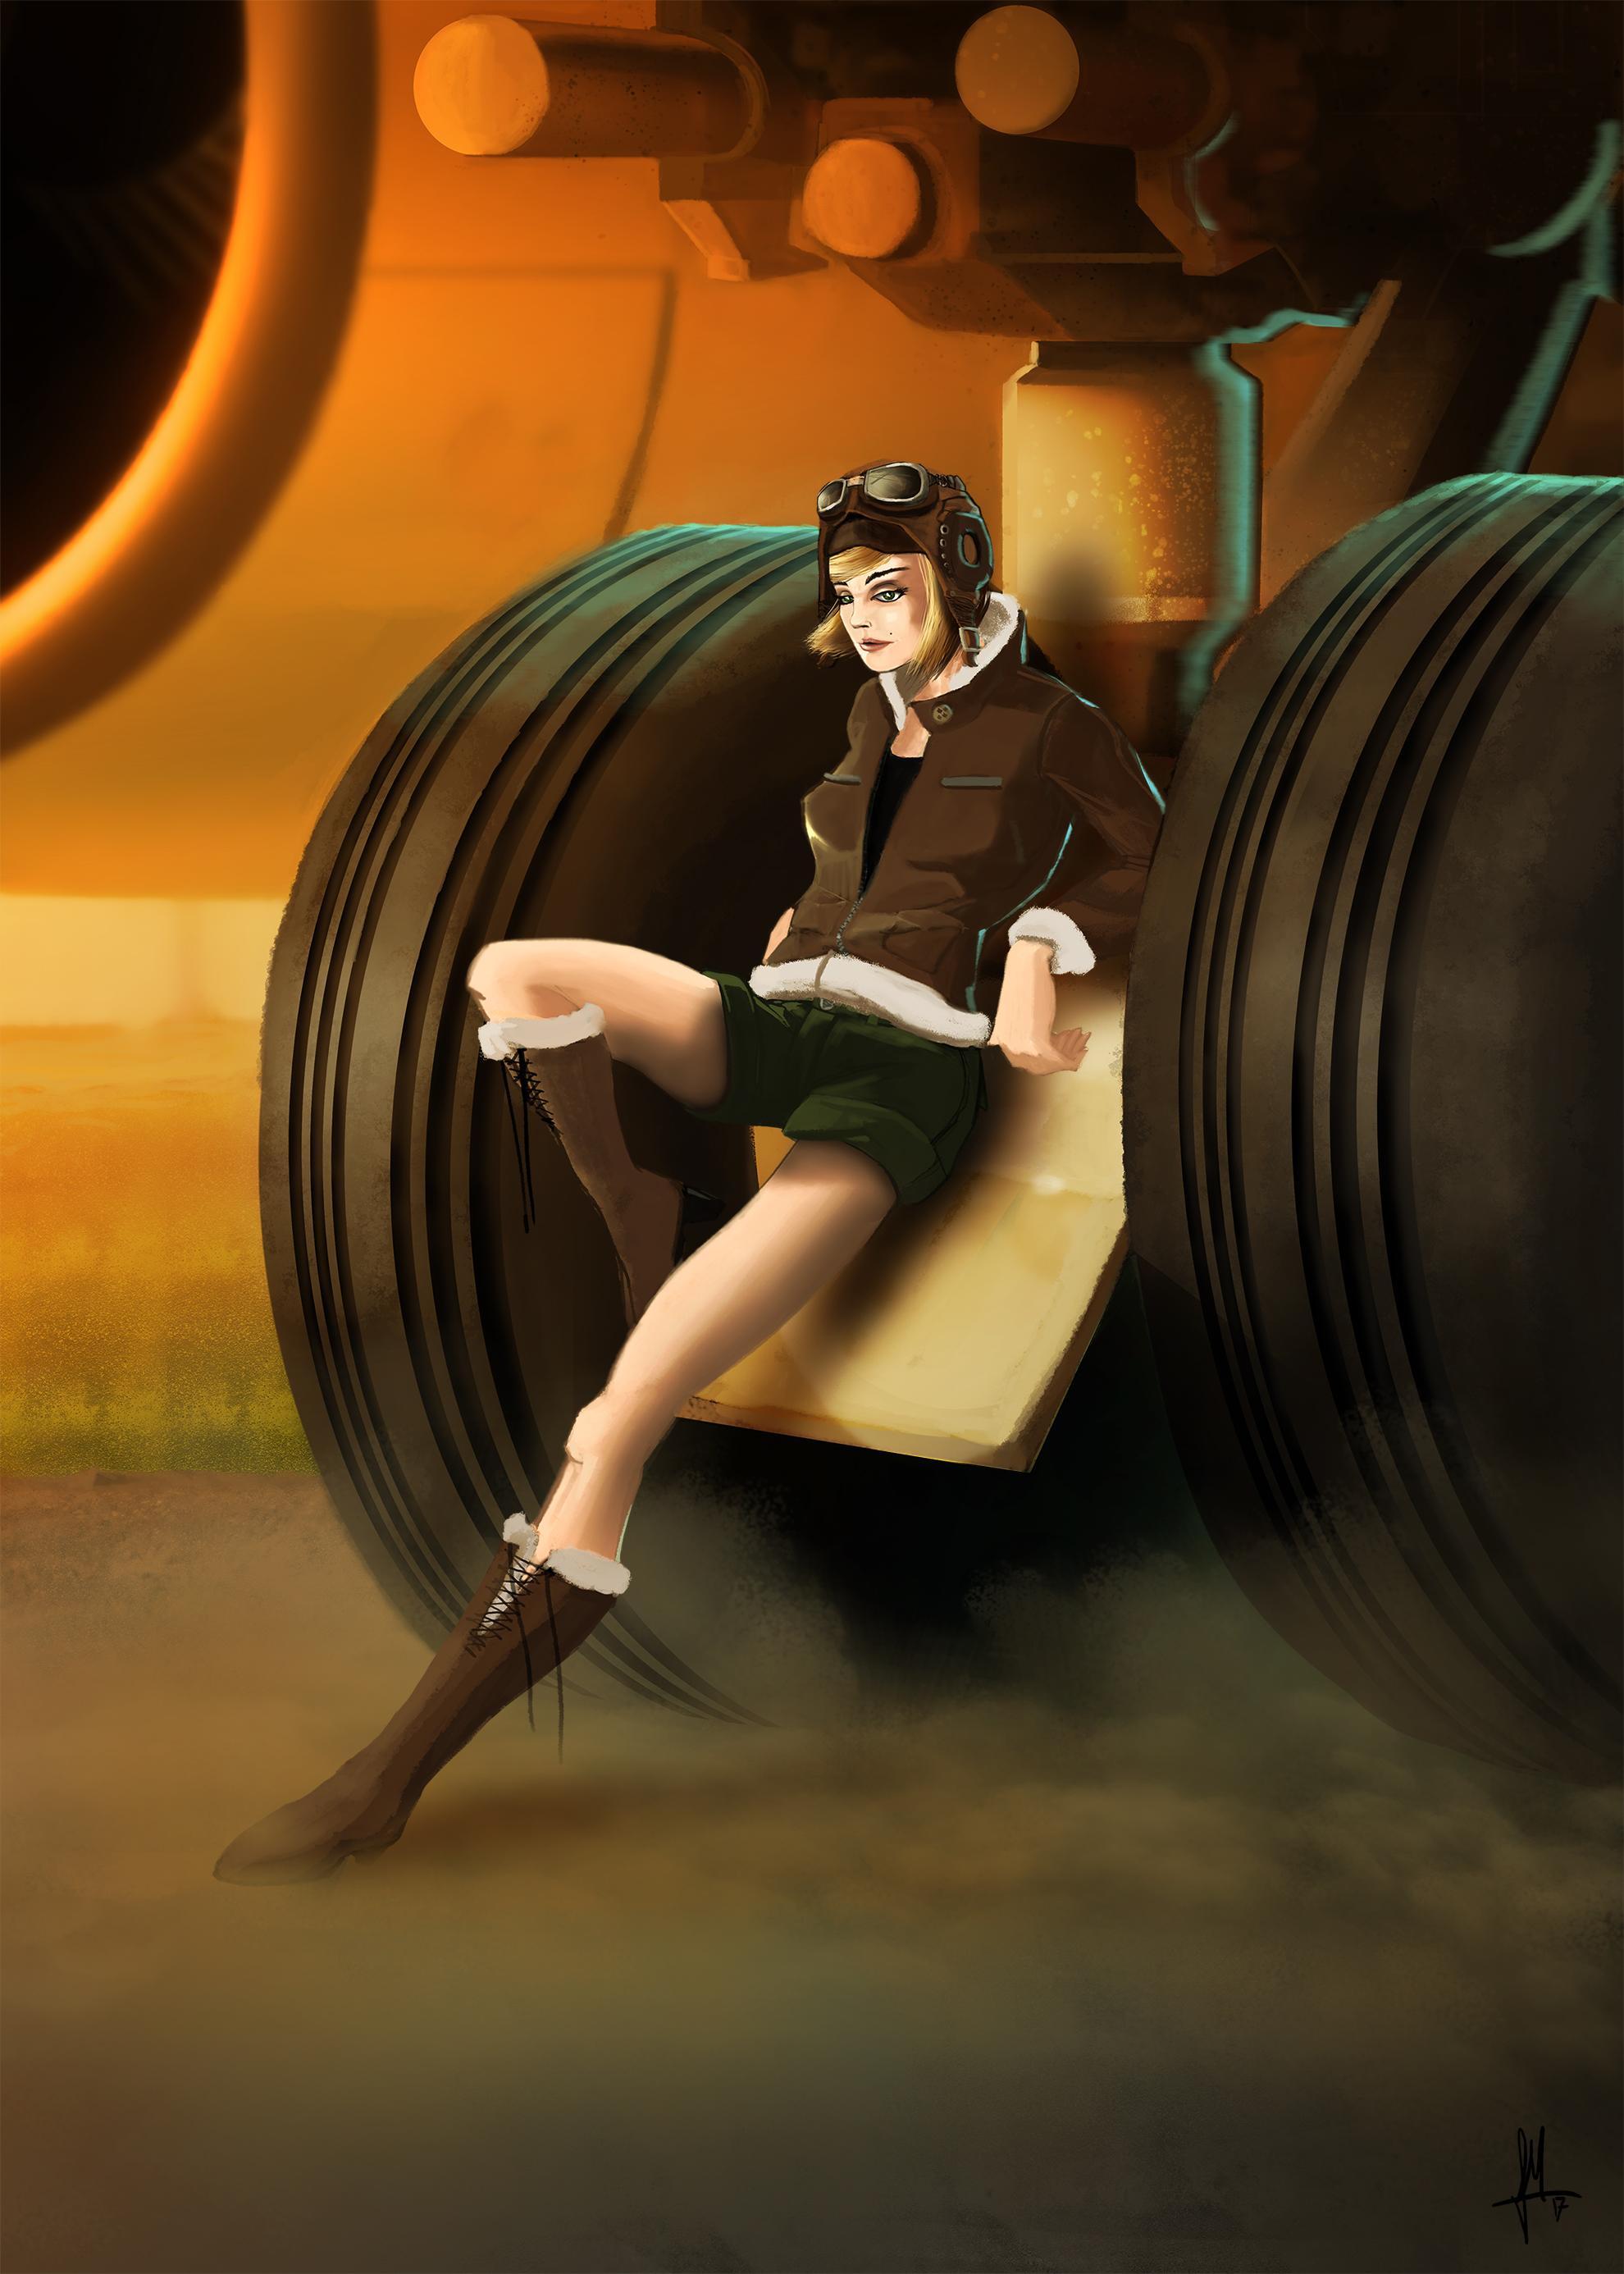 pilot army girl